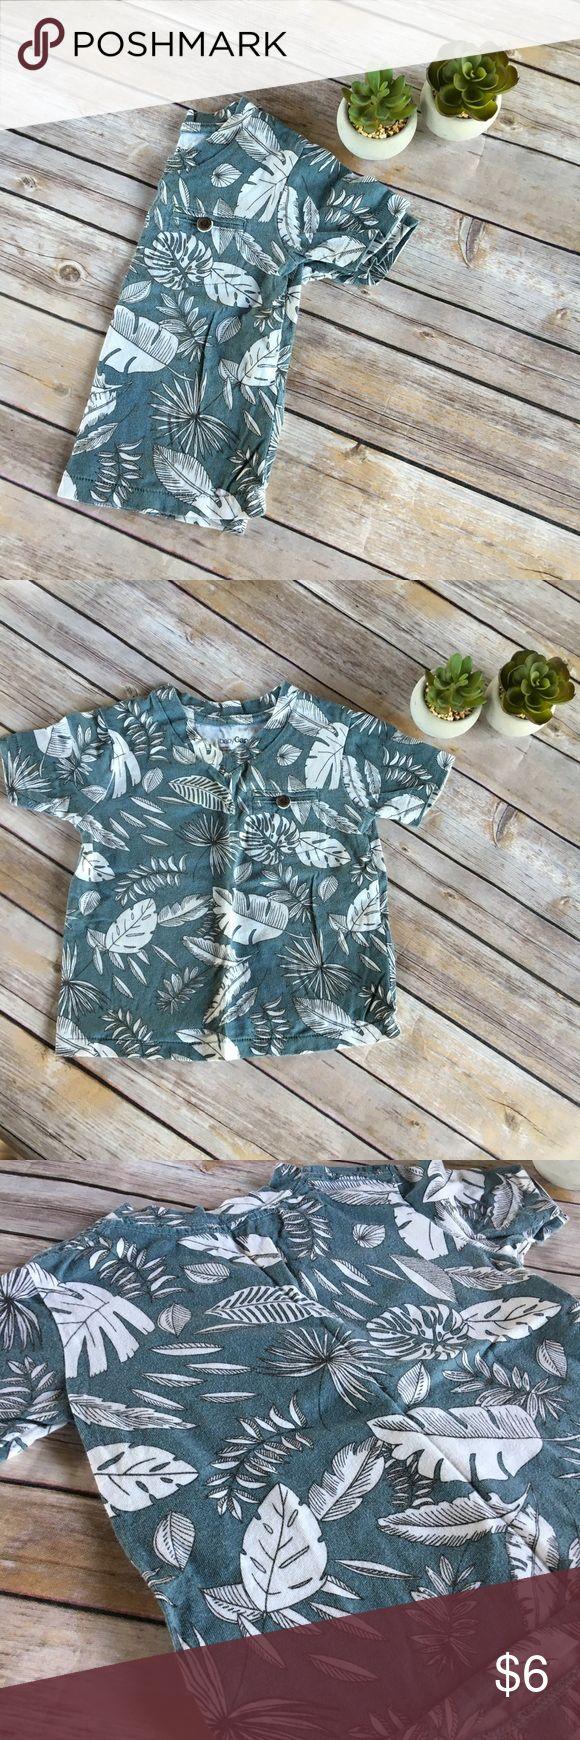 Gap tshirt Real tropical print t-shirt. EUC. No rips, holes, or stains. From a smoke free, pet-friendly home. GAP Shirts & Tops Tees - Short Sleeve